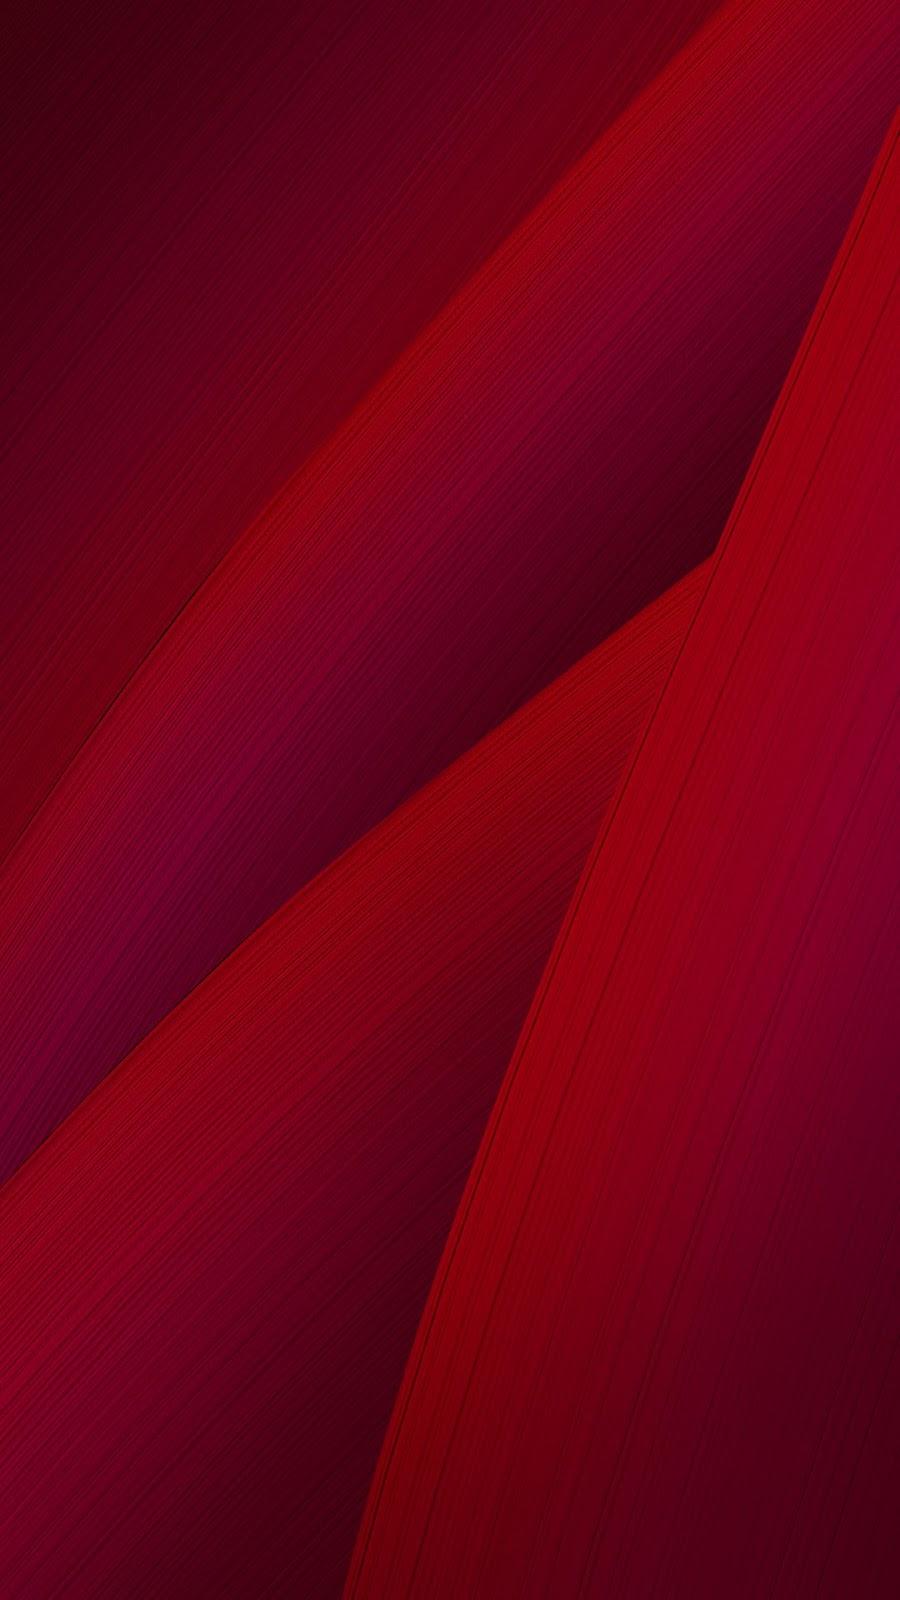 Zenfone 2 Wallpapers da Semana 1